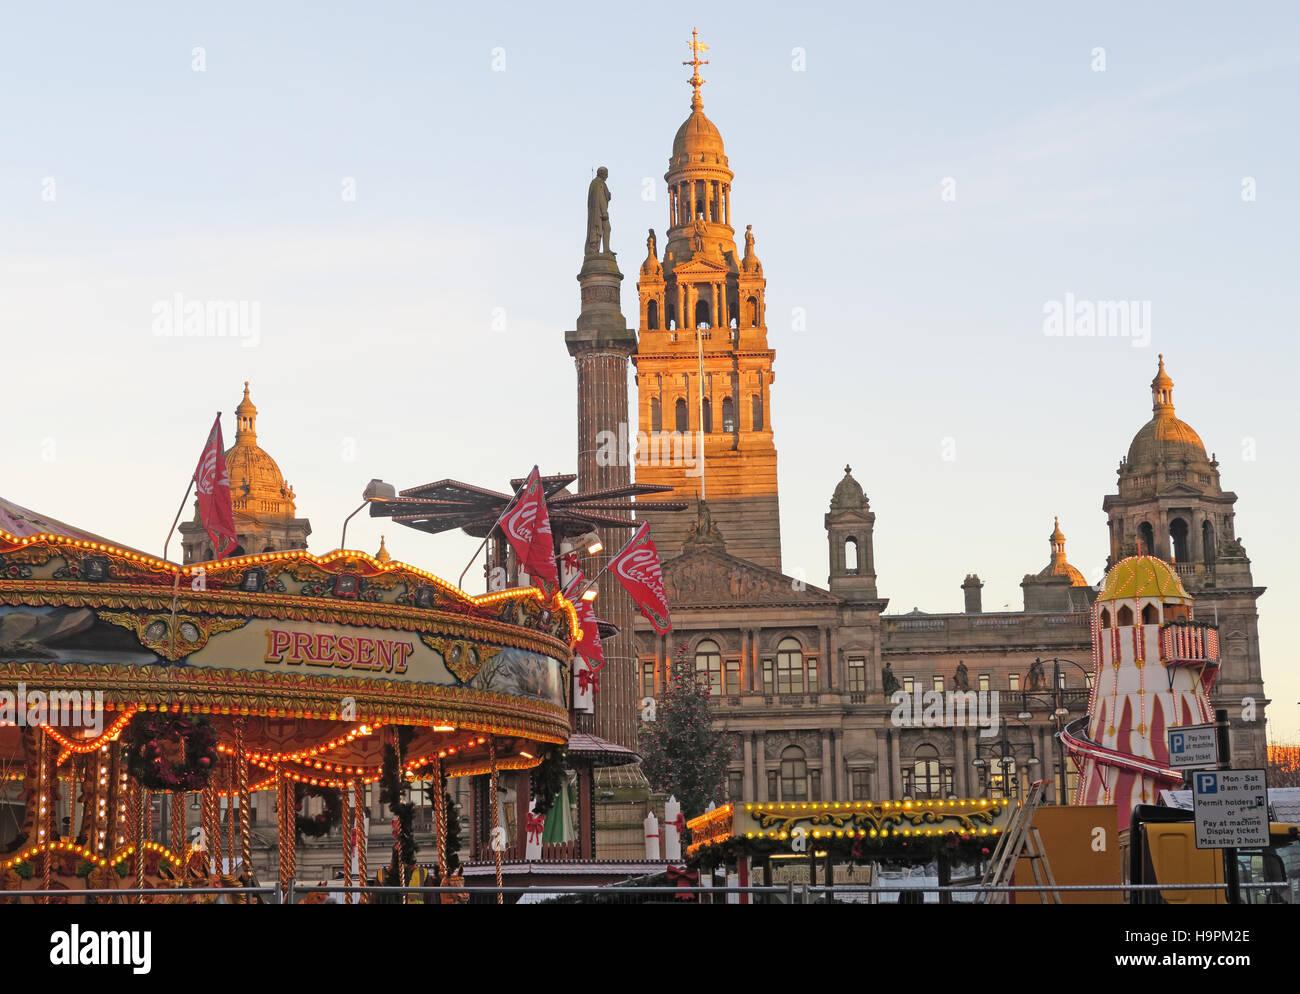 George Square Glasgow at Christmas - Fairground and continental market, Scotland, UK Stock Photo